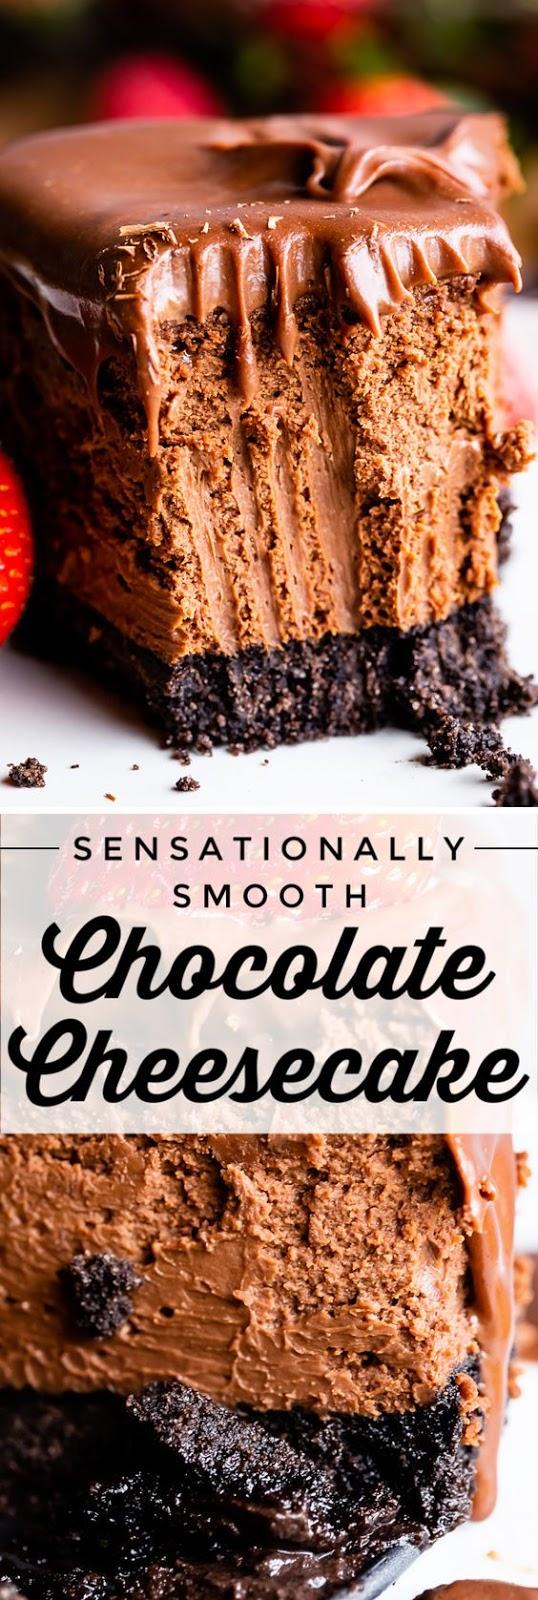 Sensationally Smooth Chocolate Cheesecake